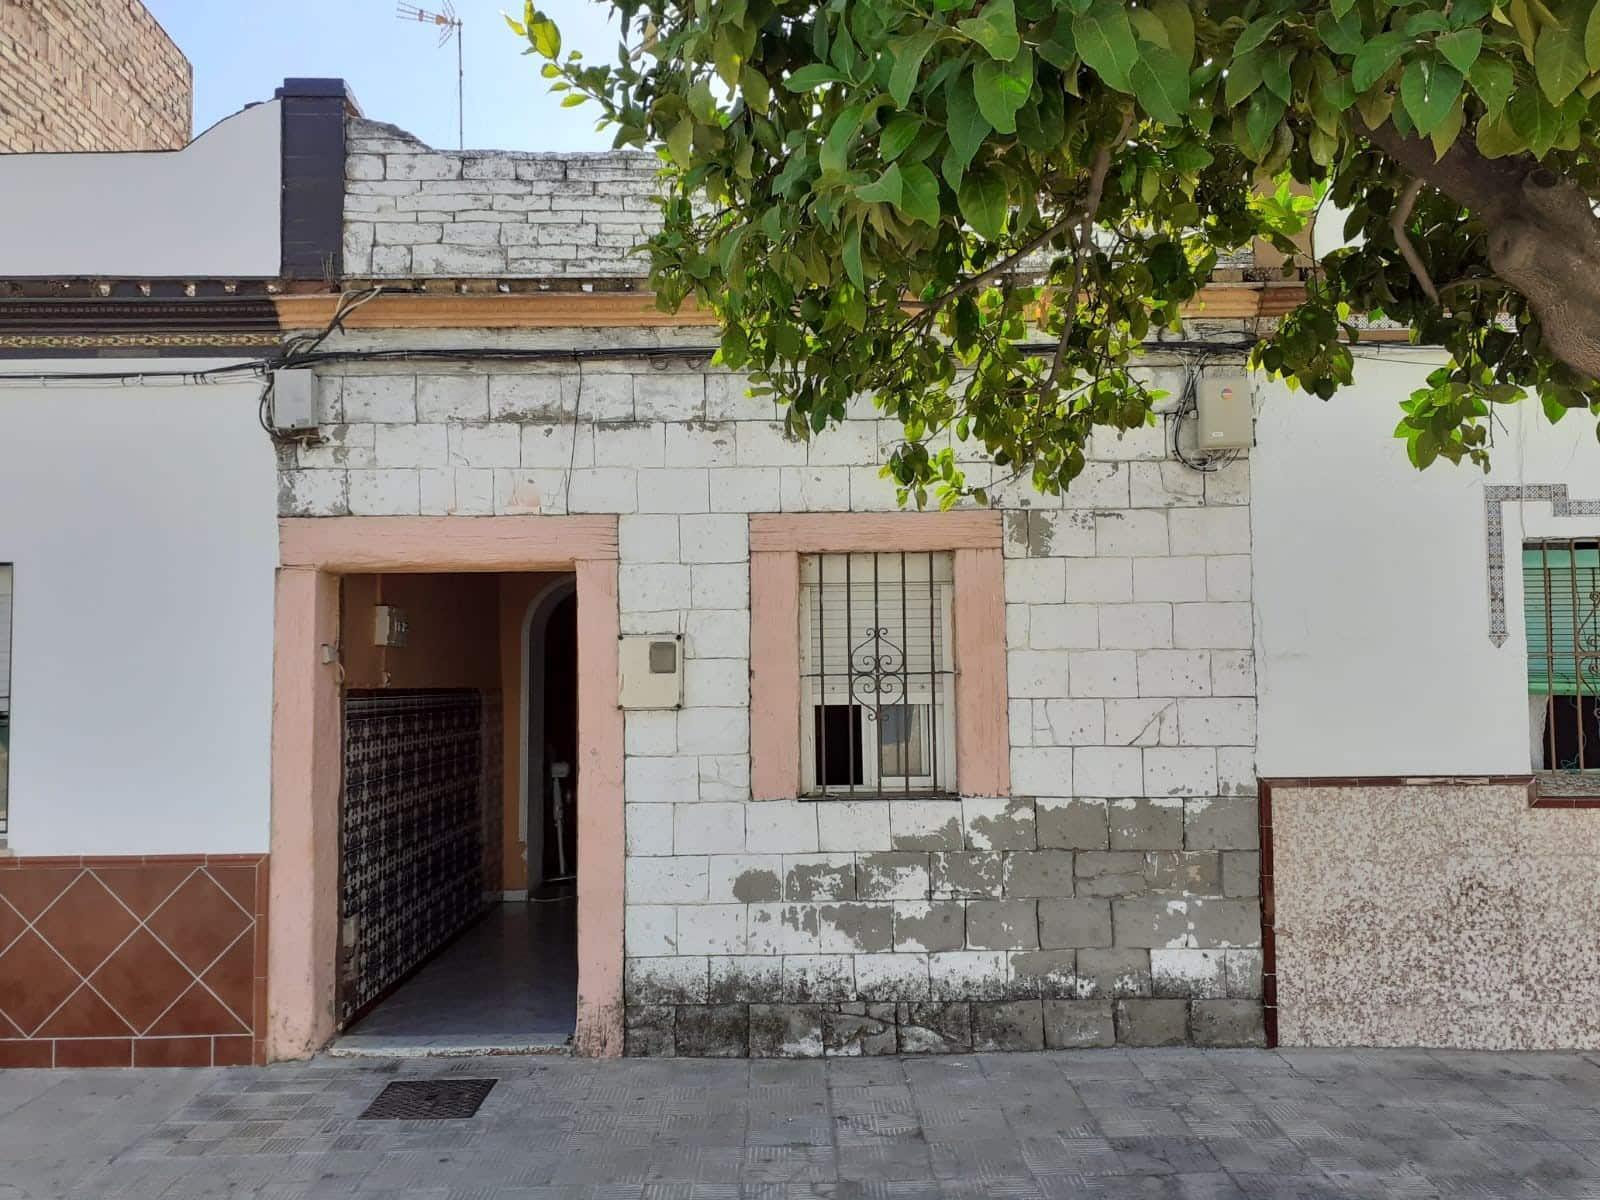 2 sypialnia Dom szeregowy na sprzedaż w Los Palacios y Villafranca - 60 000 € (Ref: 6234710)